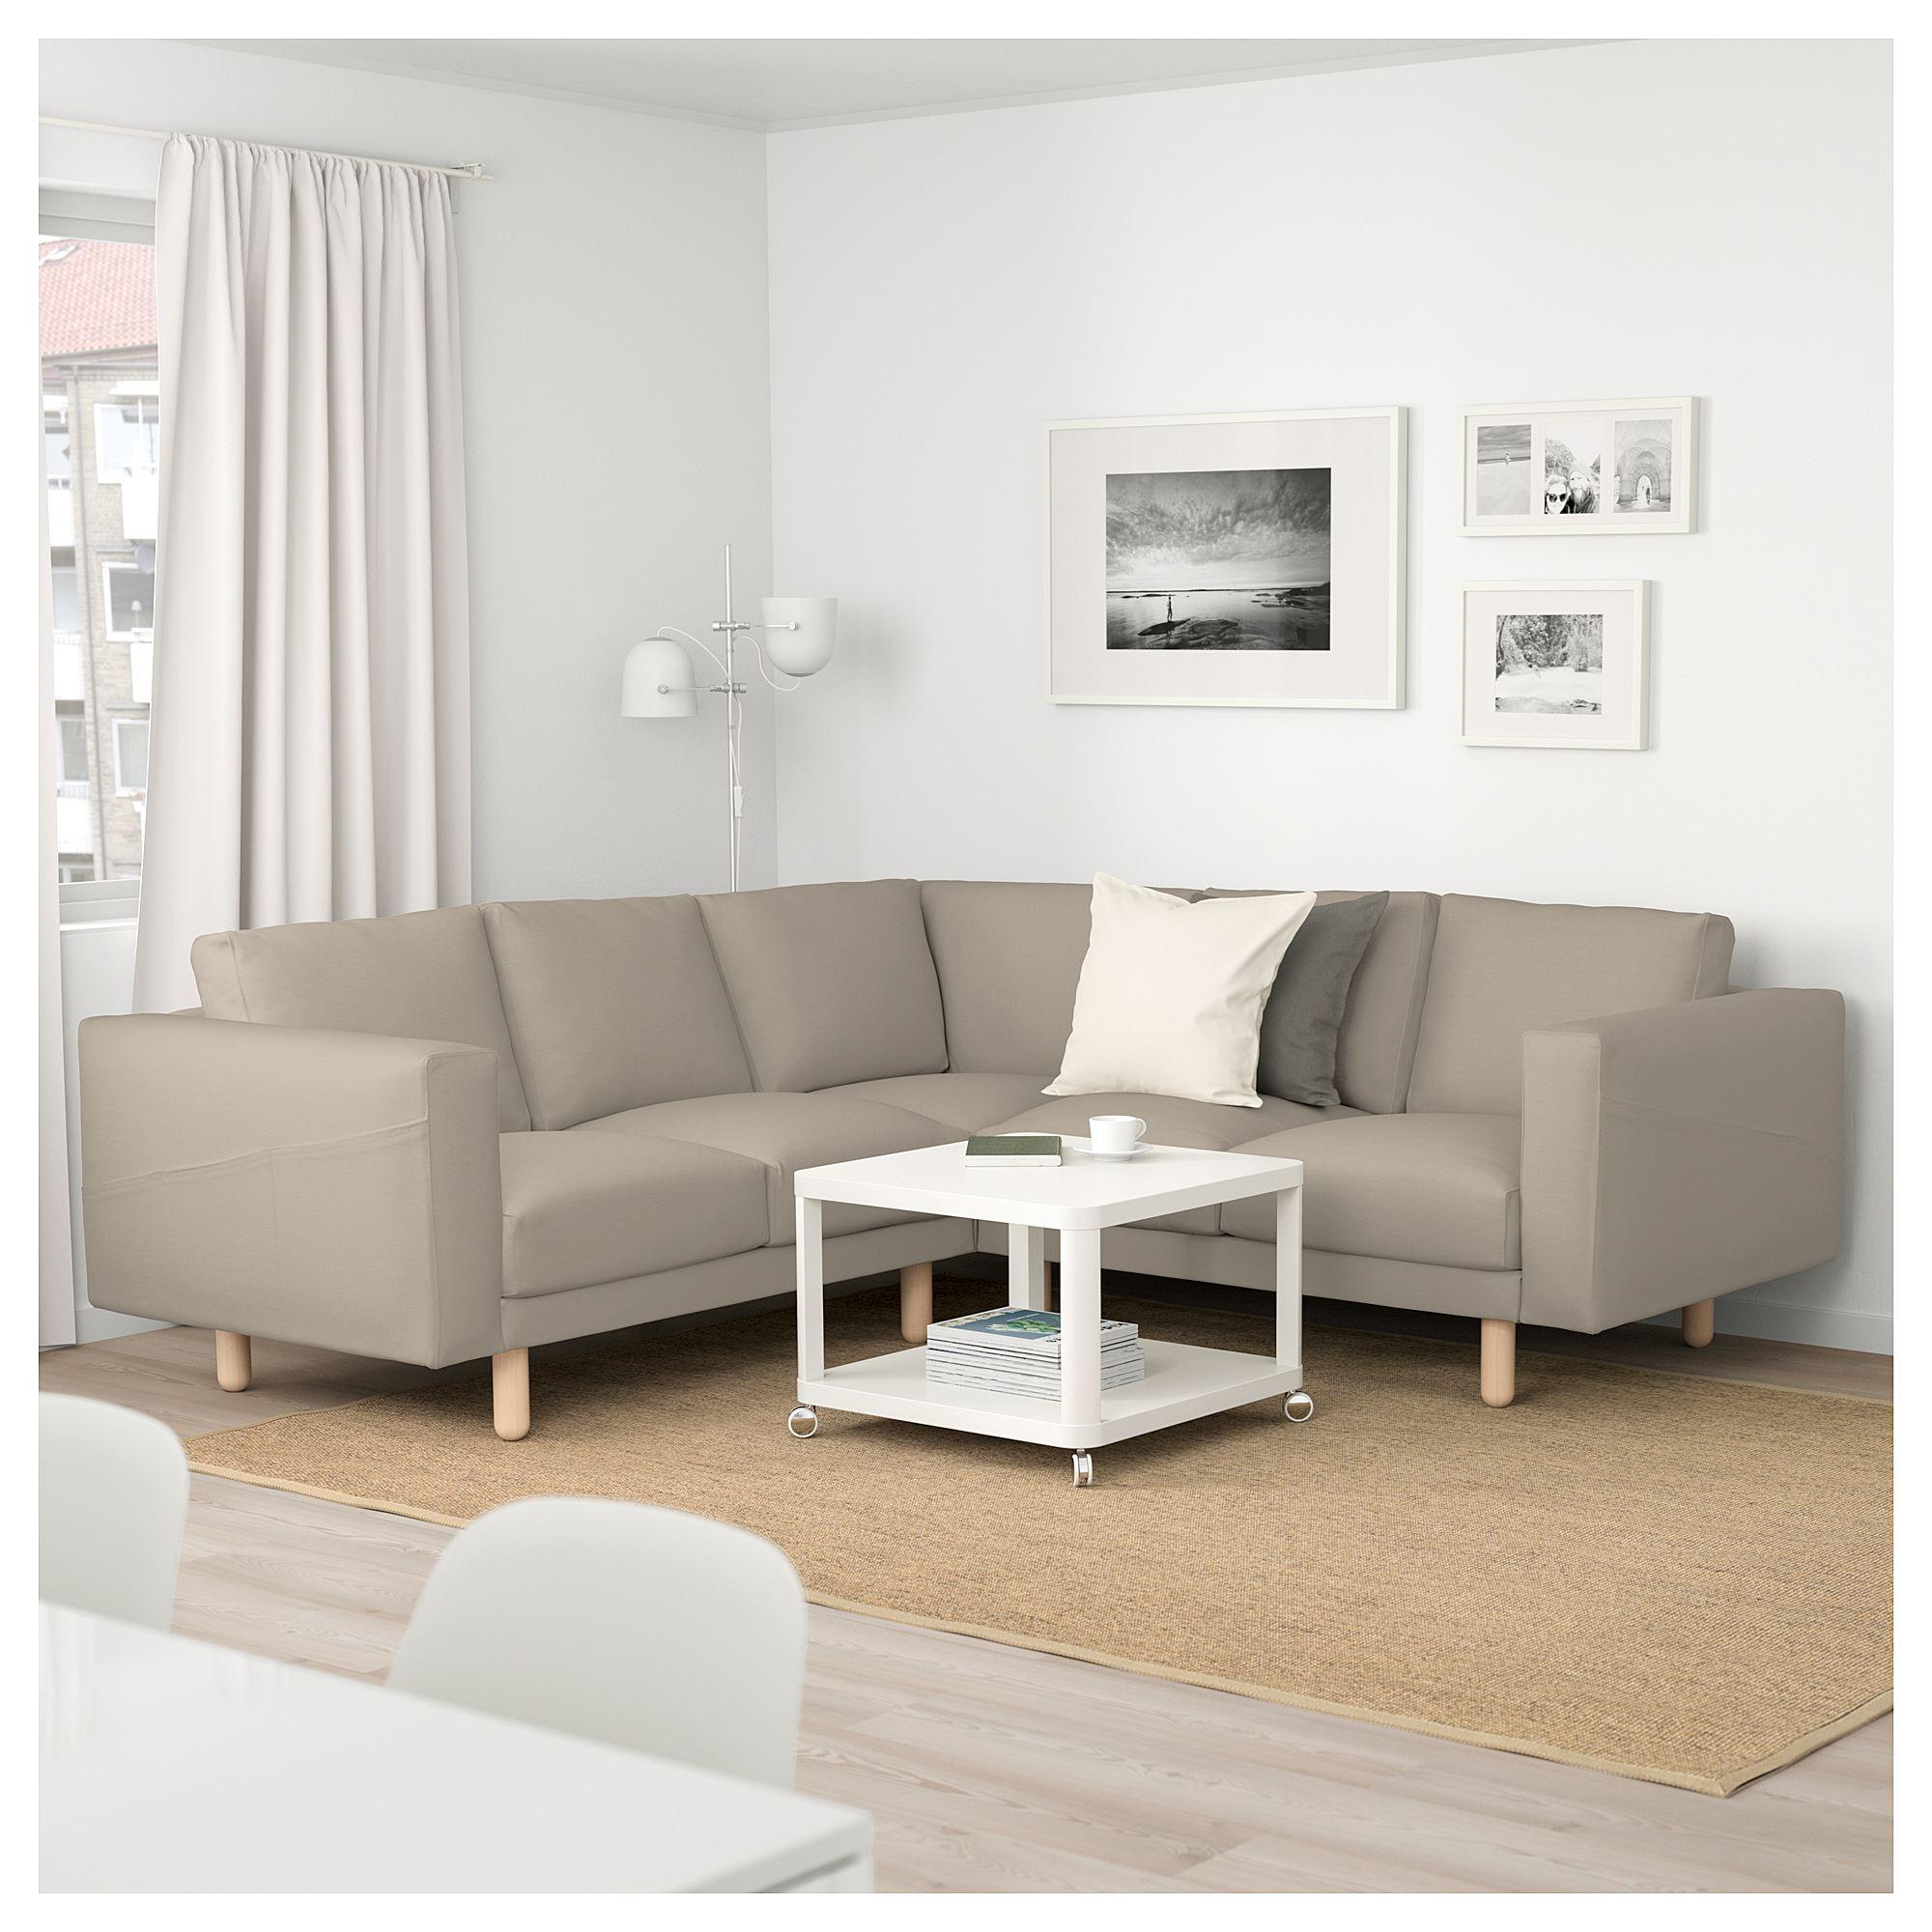 norsborg 4seat corner sofa edum beigebirch  ikea living